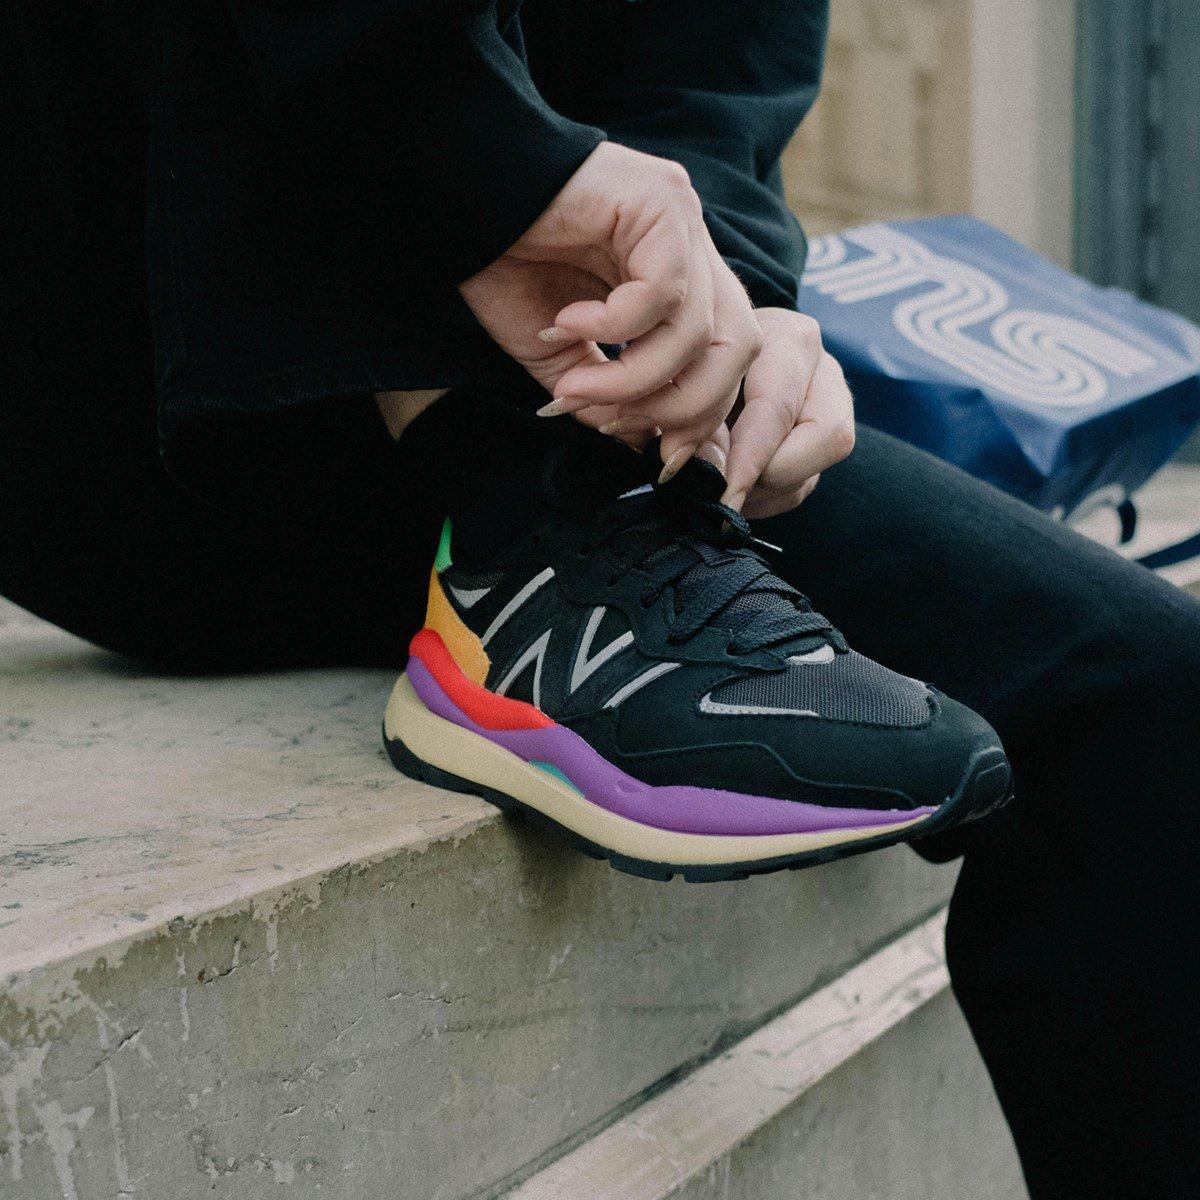 New Balance M5740 - M5740lb - SNS   sneakers & streetwear online ...